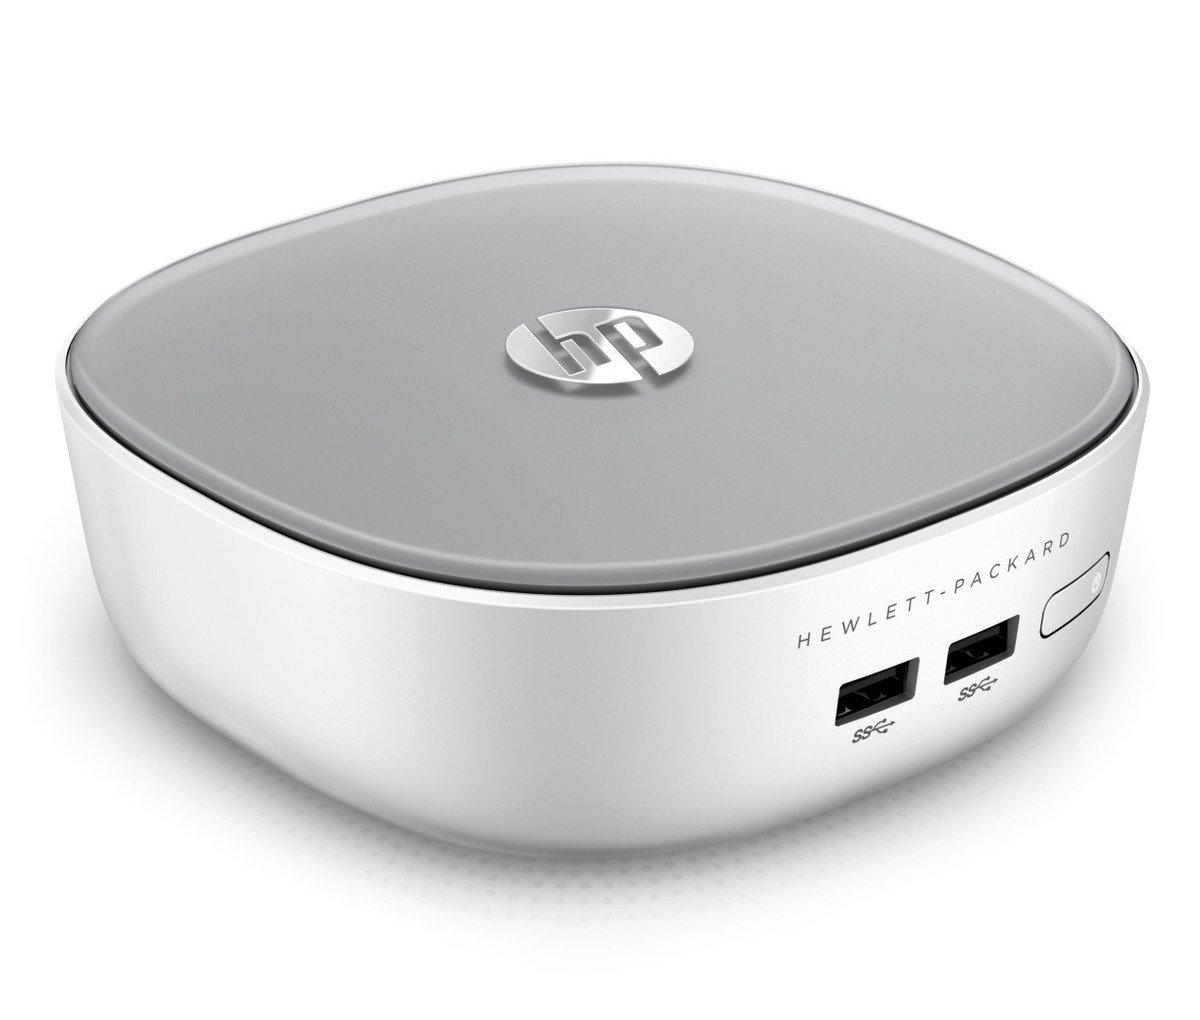 HP Pavilion Mini 300-030hk 桌面電腦+耳機+無線藍芽揚聲器套裝